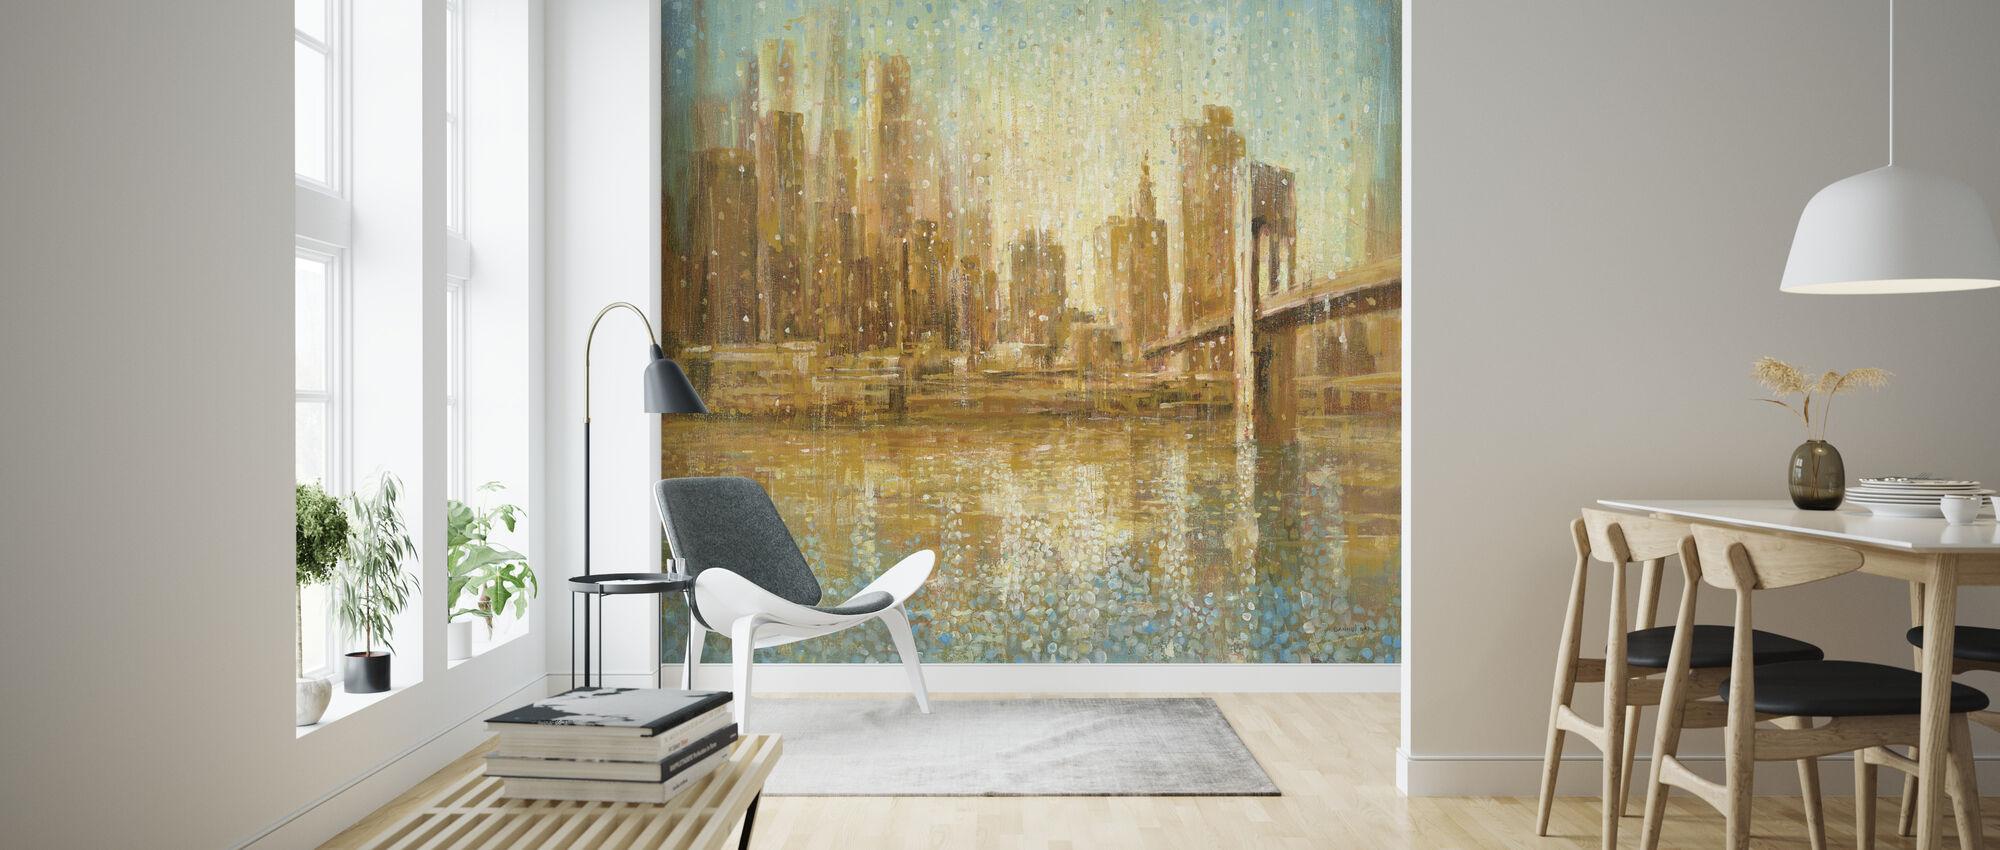 Champagne City - Wallpaper - Living Room